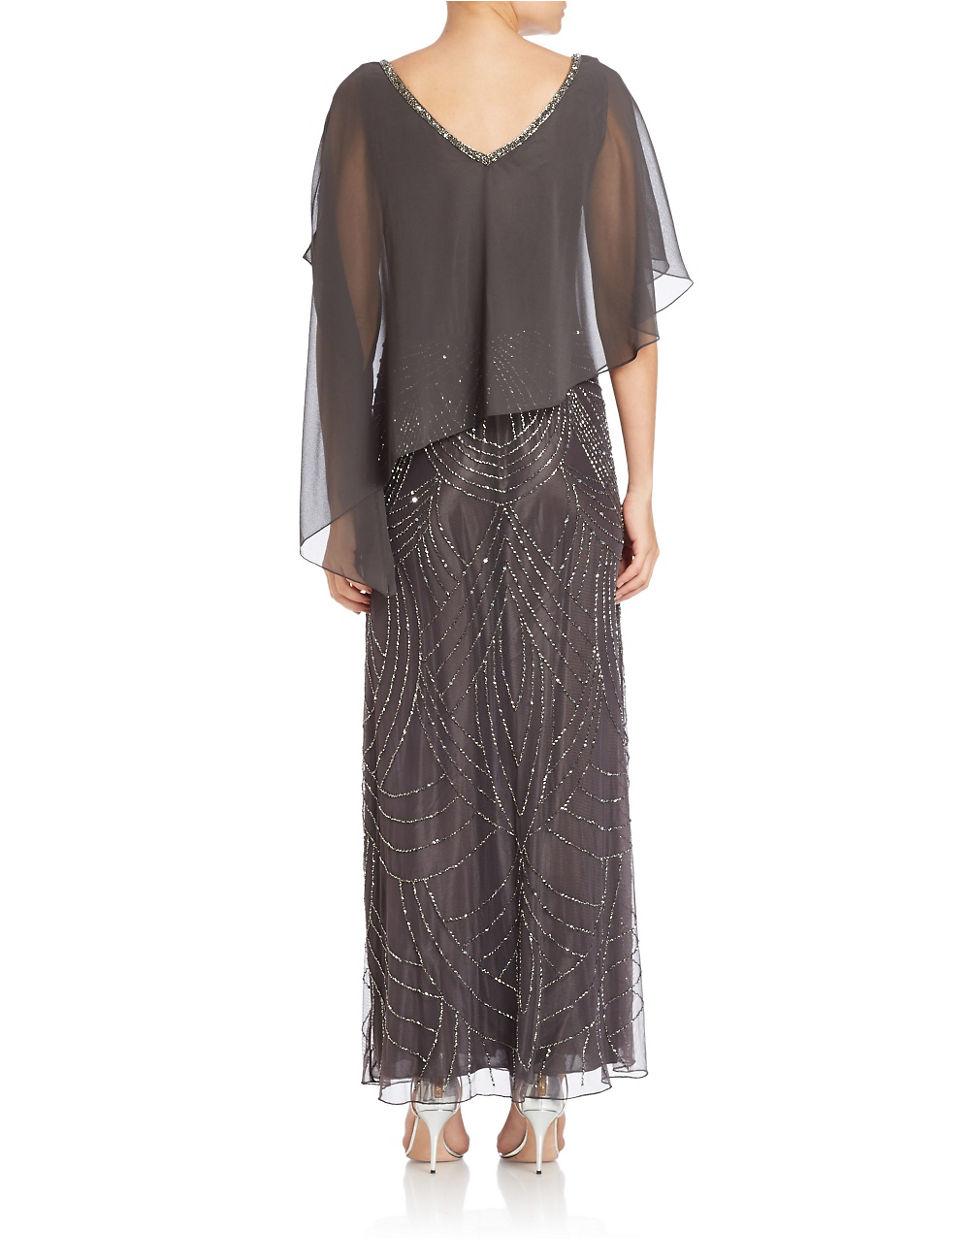 Lyst - J Kara Asymmetrical Popover Gown in Gray